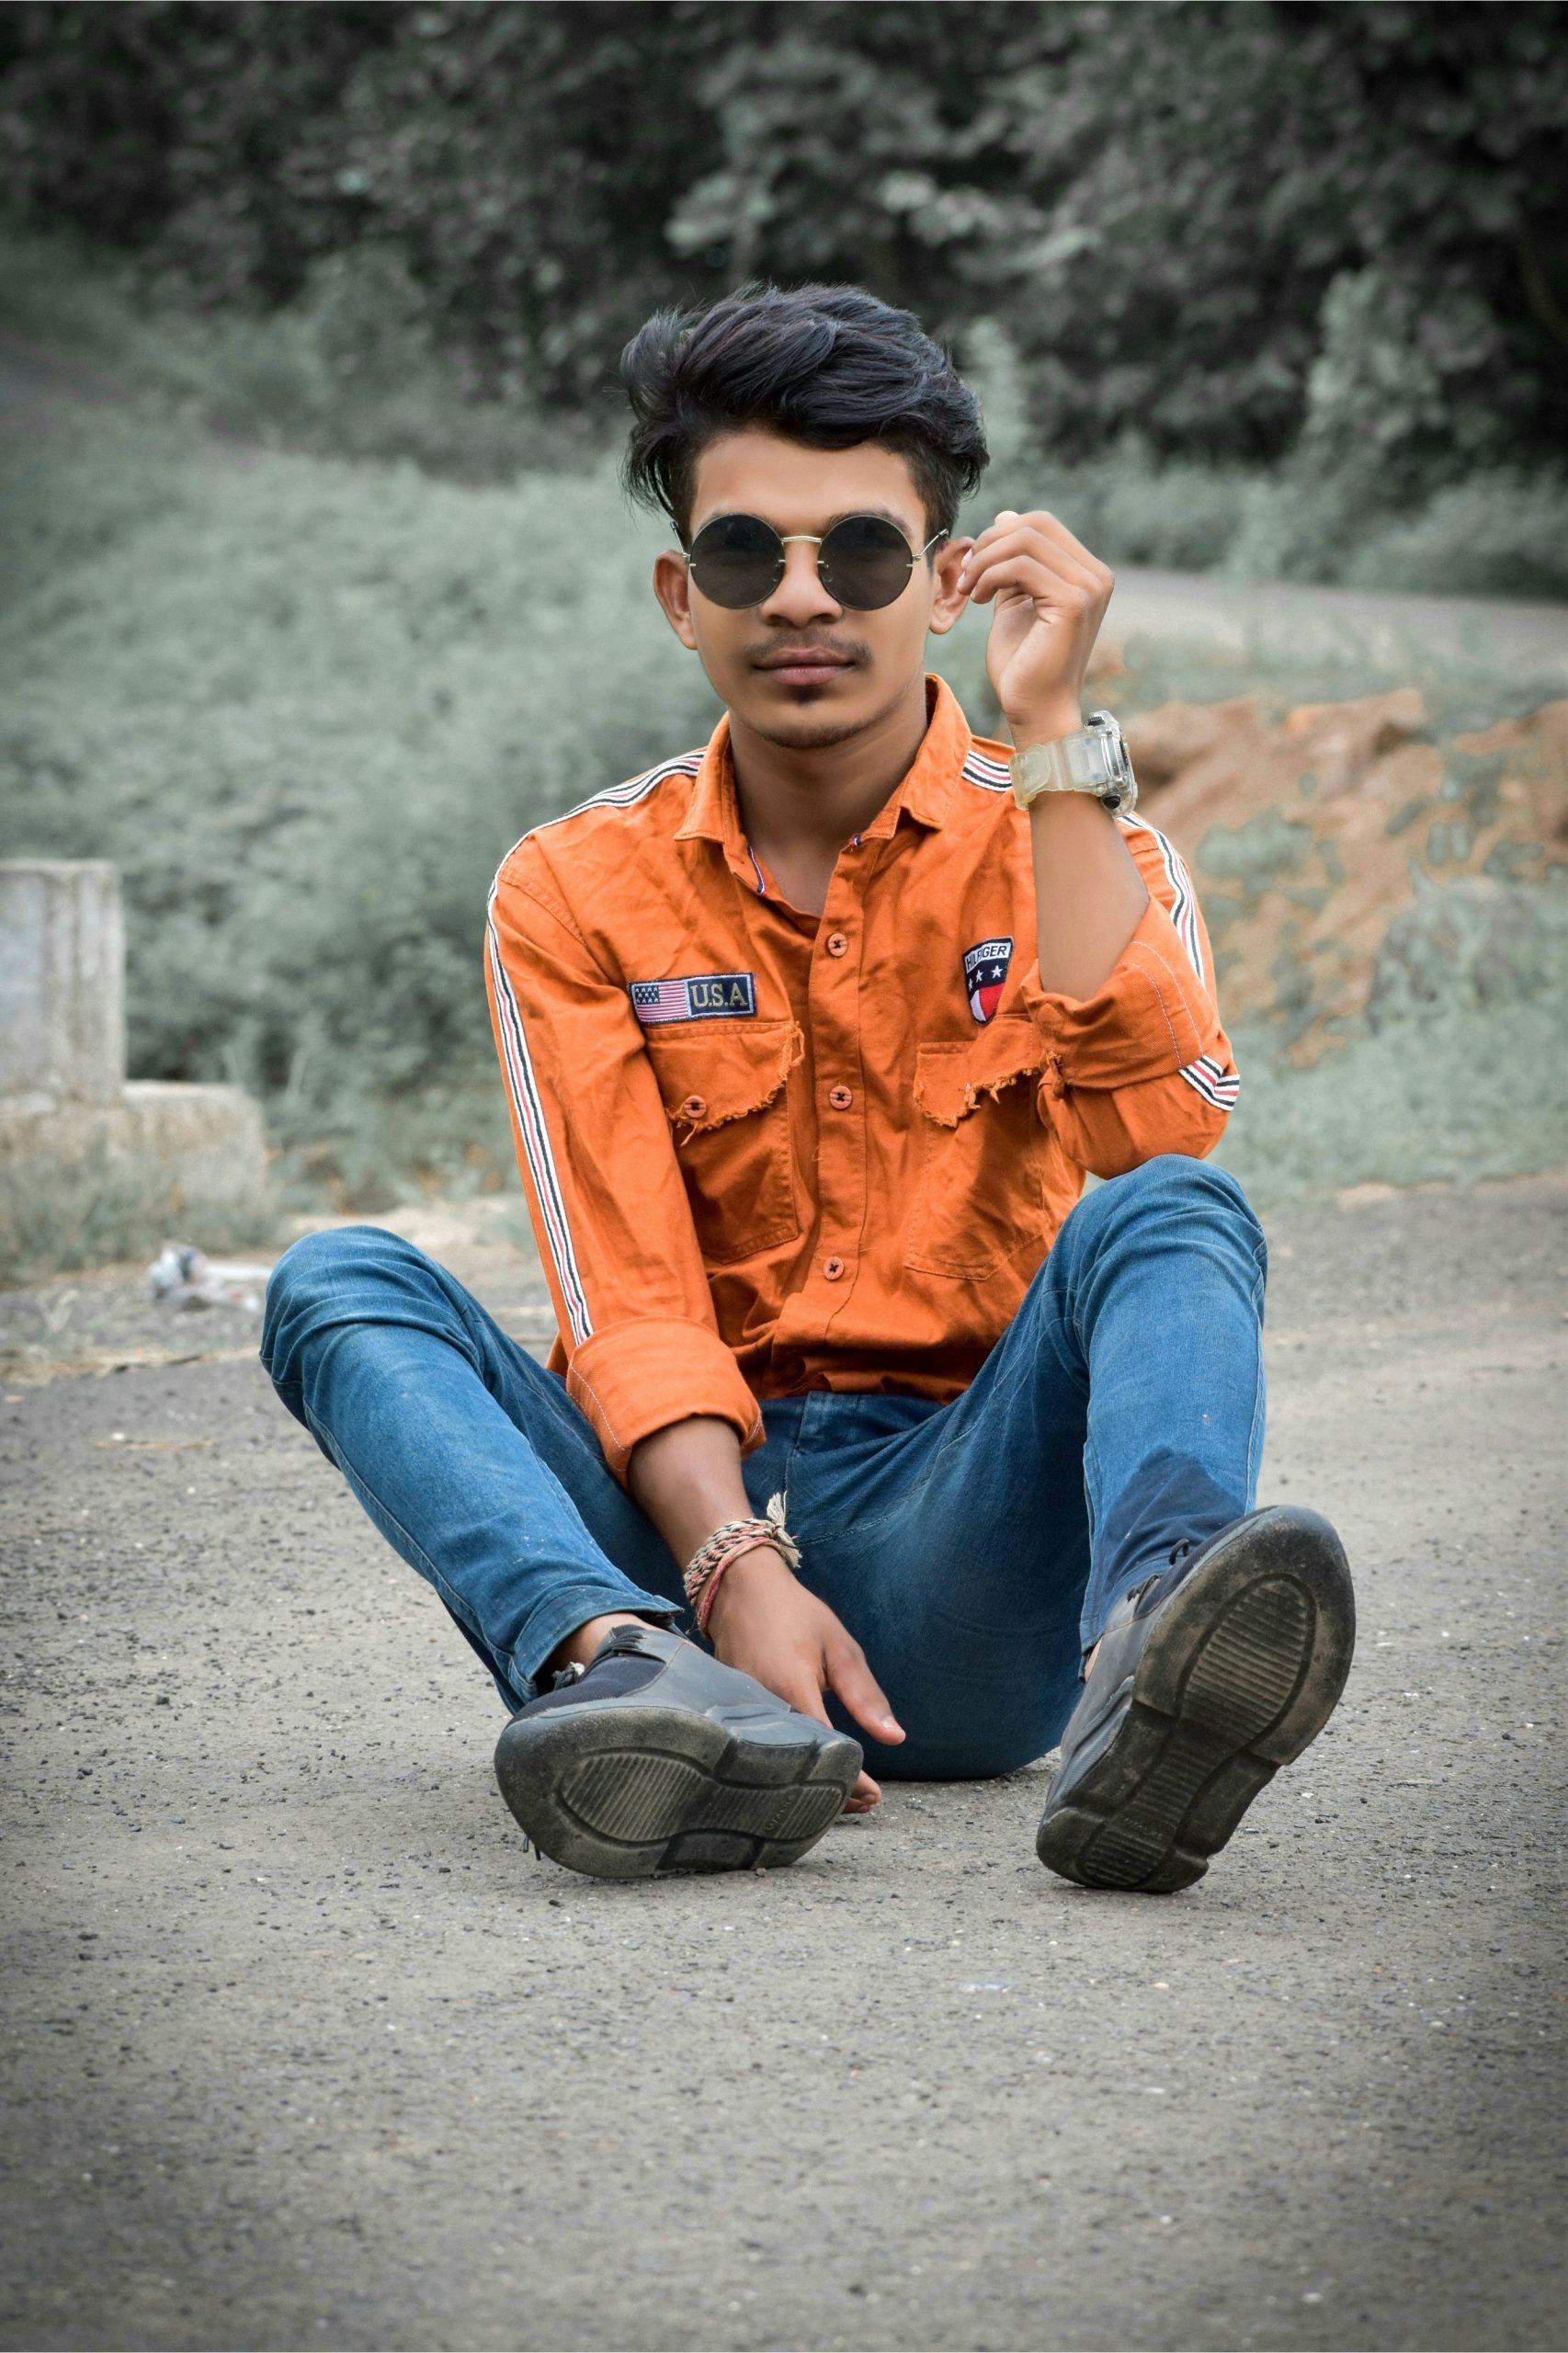 Boy posing on street